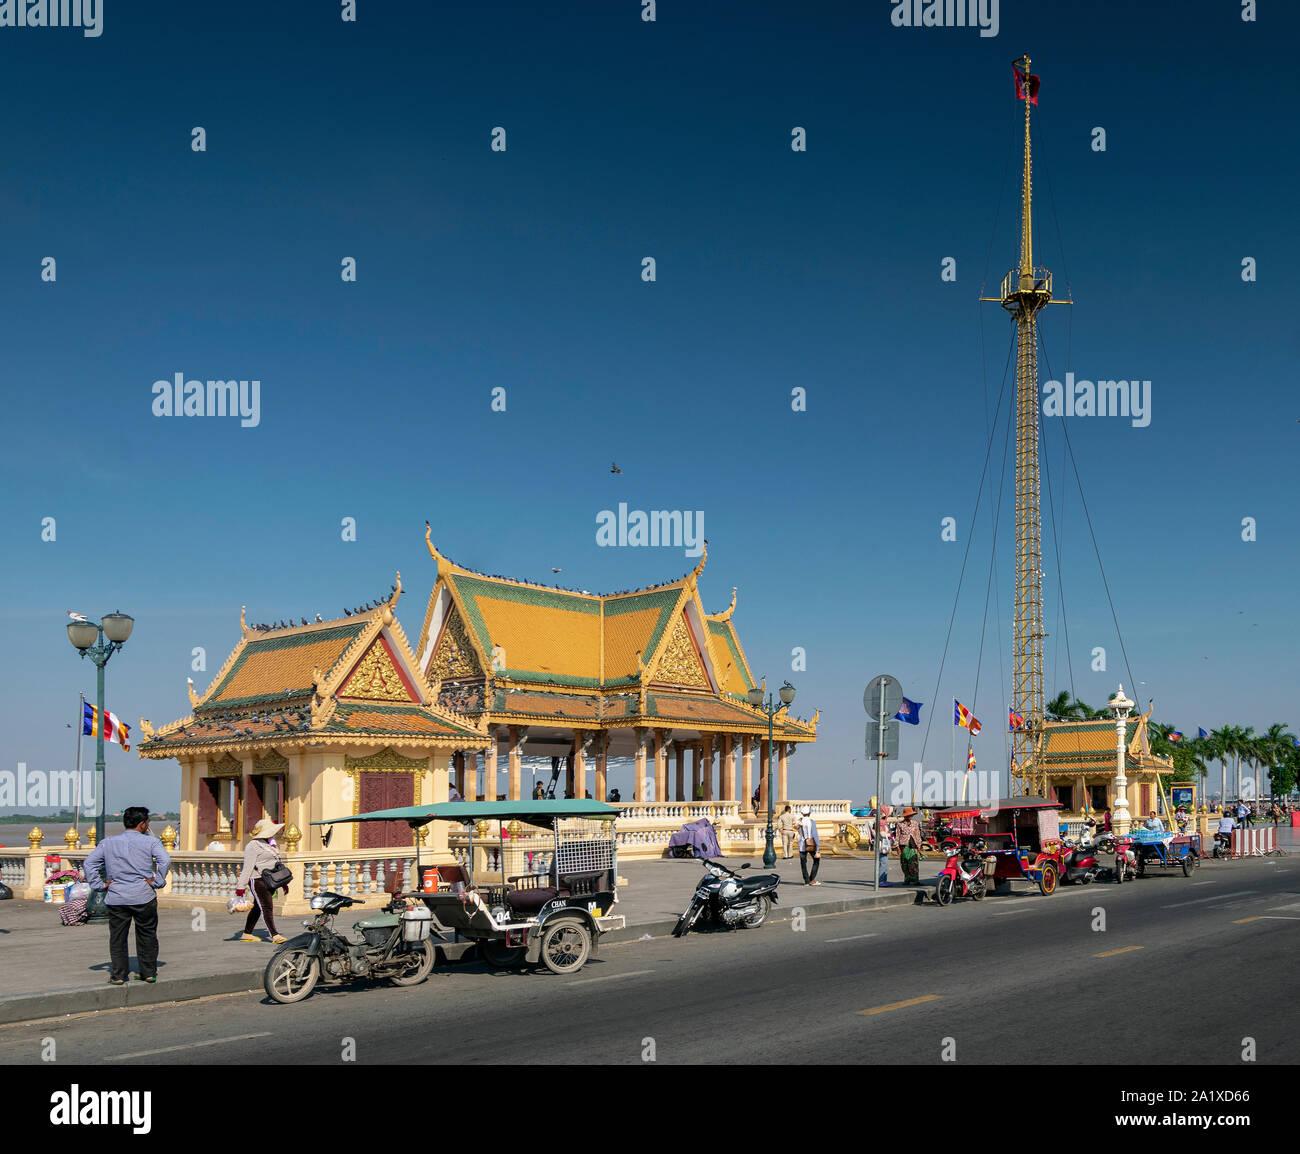 Preah Ang Dorngkeu Shrine landmark on sisowath quay in riverside area of downtown phnom penh city cambodia Stock Photo